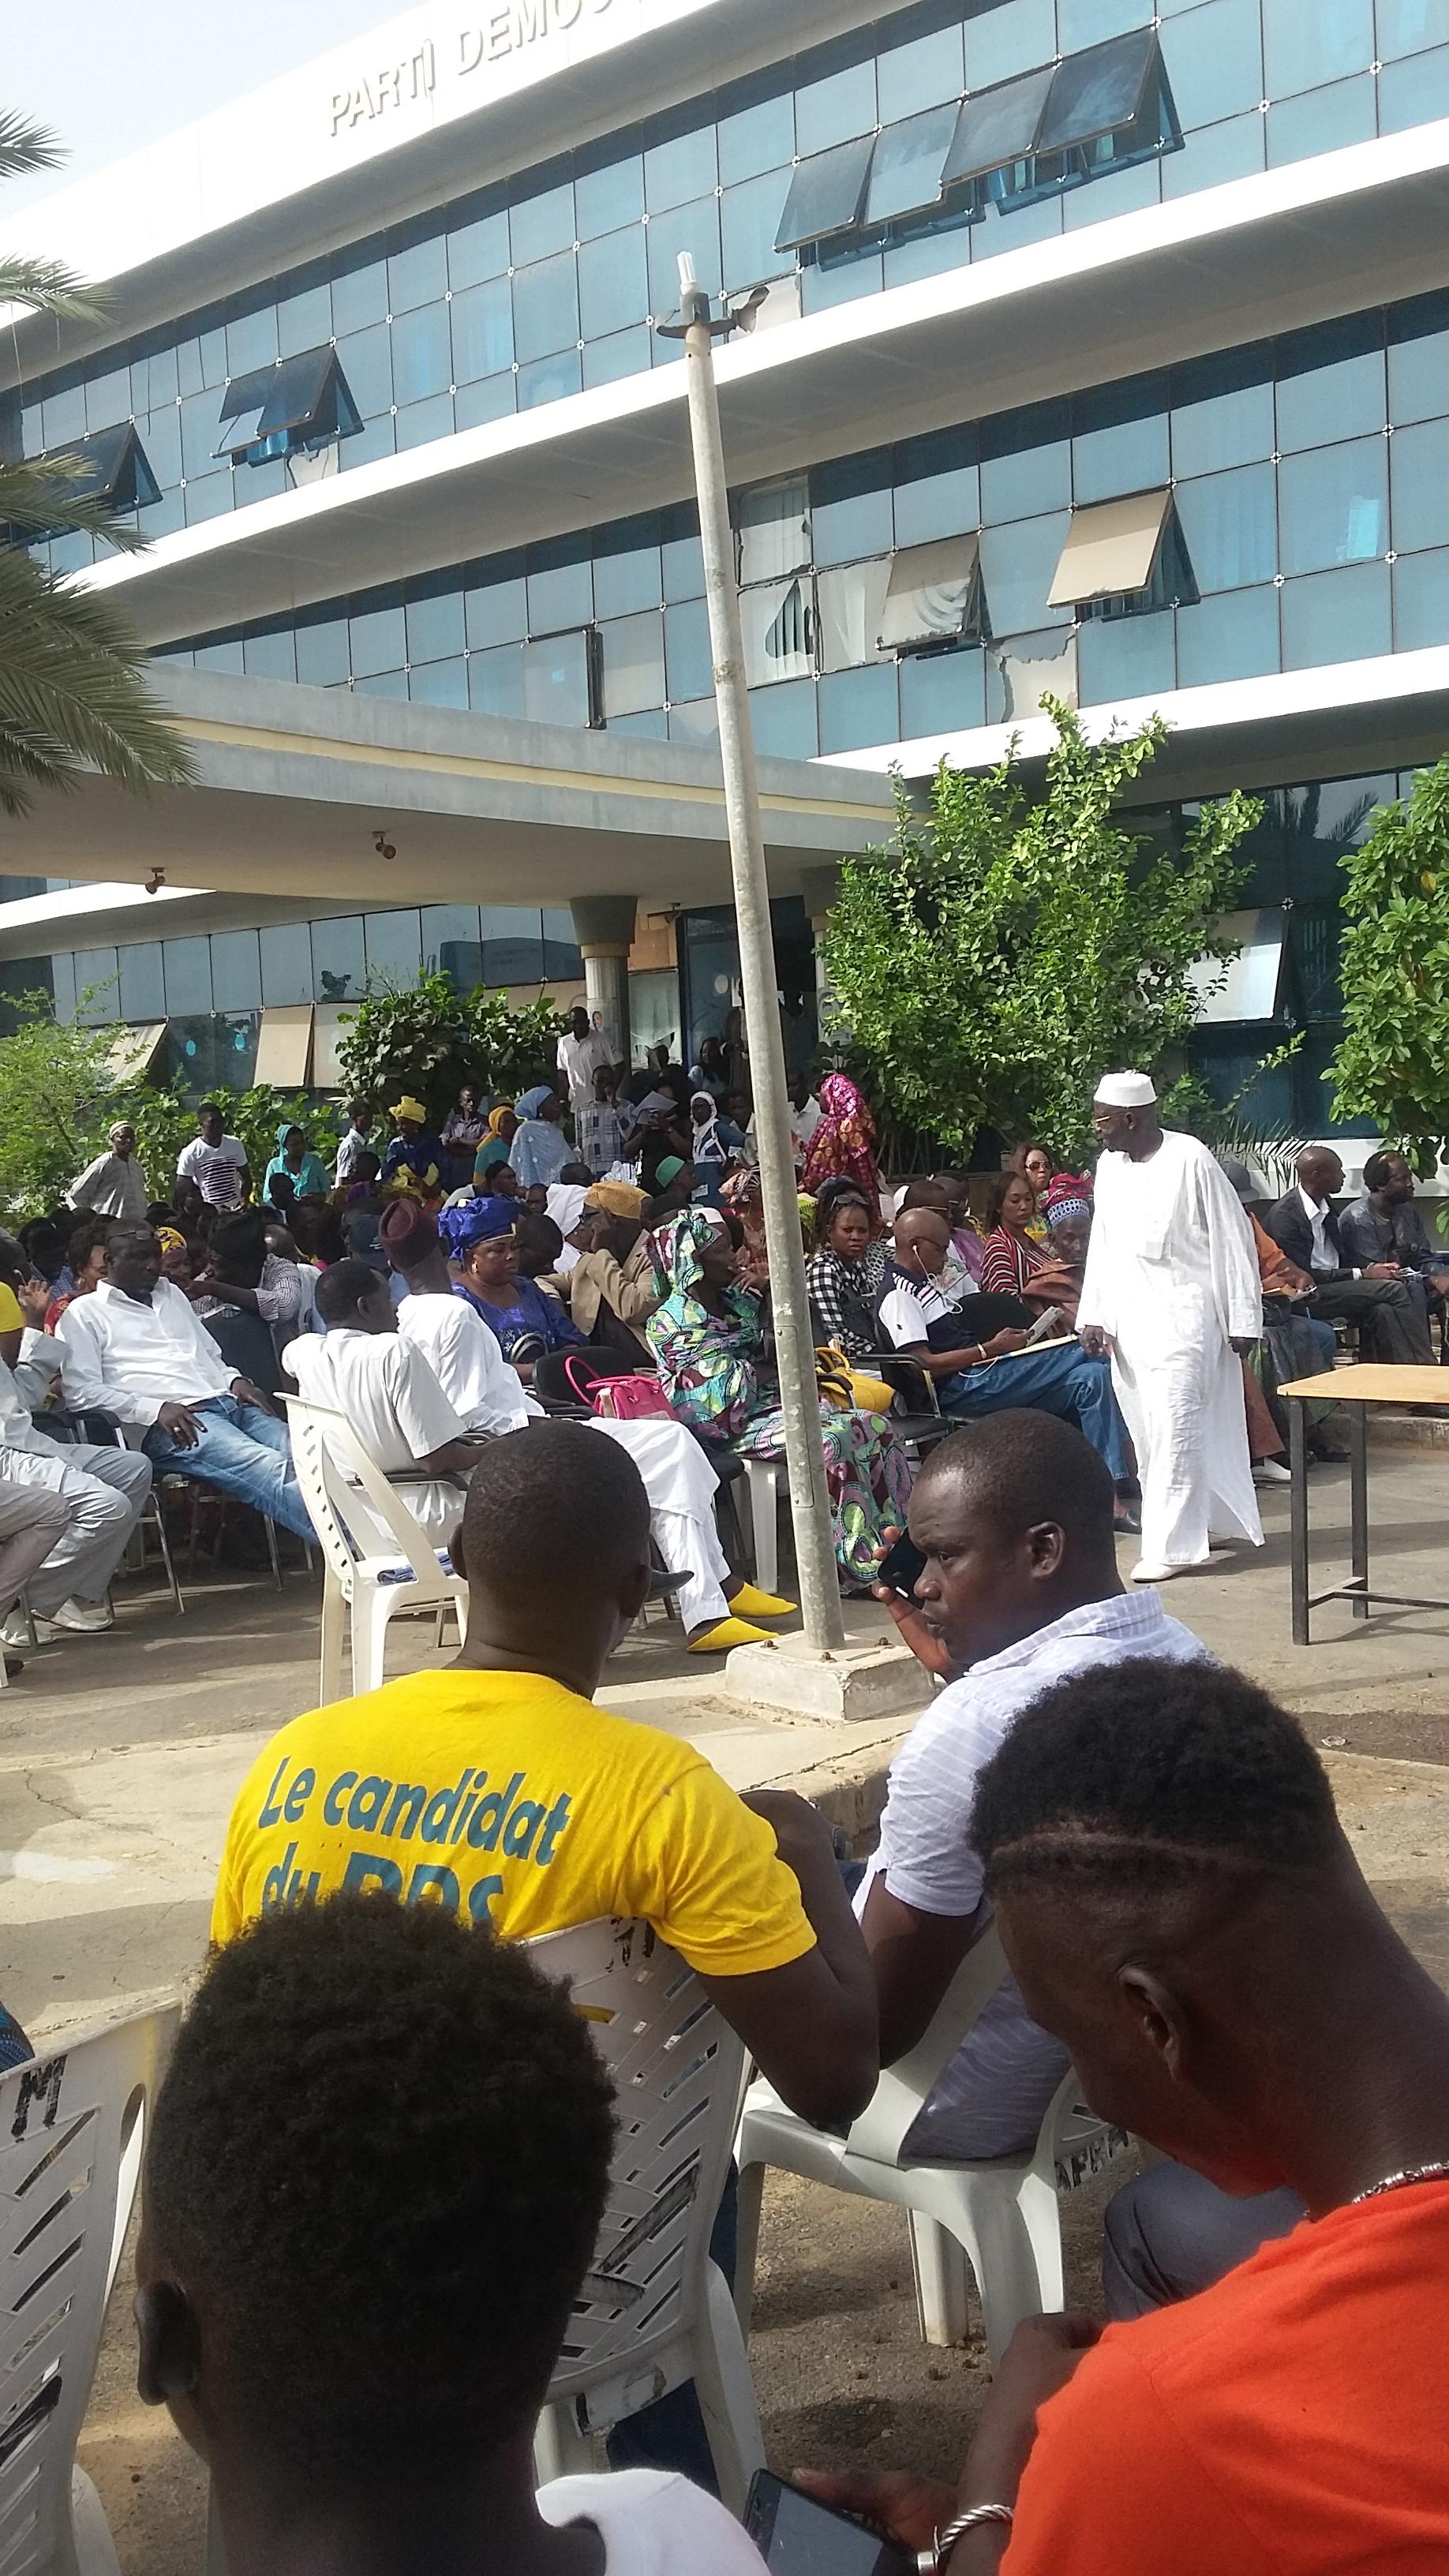 Manko Wattu Senegaal : Une coquille vide... sans Wade